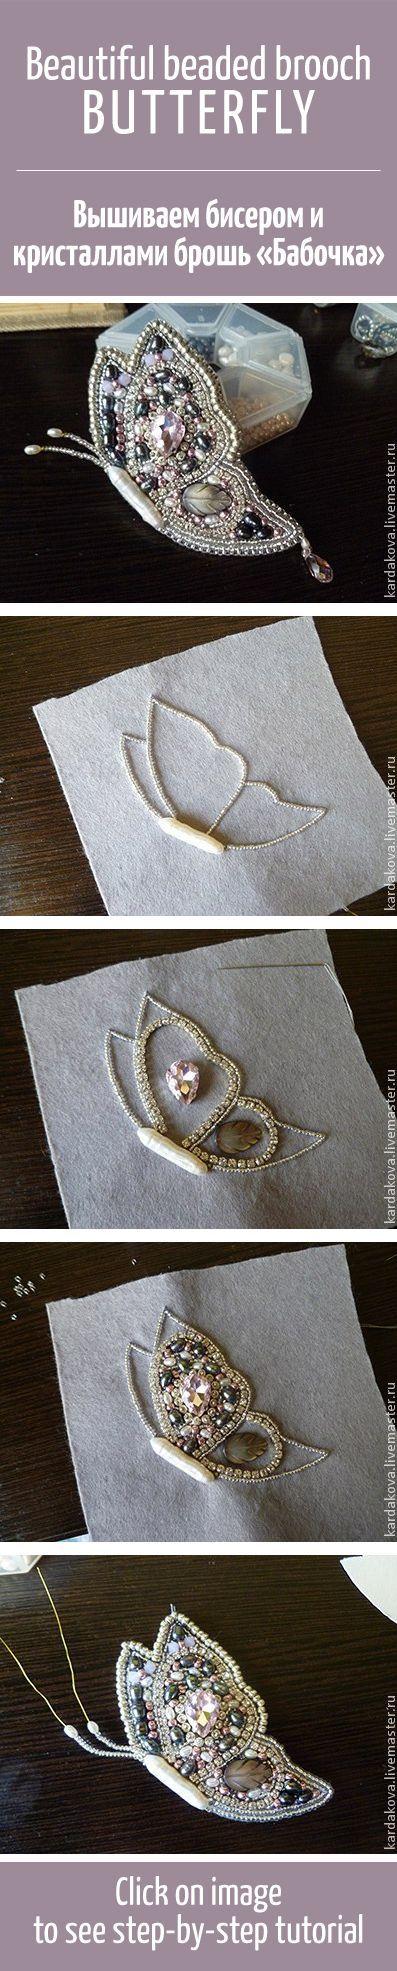 "Beautiful beaded brooch Butterfly tutorial #handmade #art #design / ""Лунная бабочка"": процесс вышивки красивой броши бисером и кристаллами"